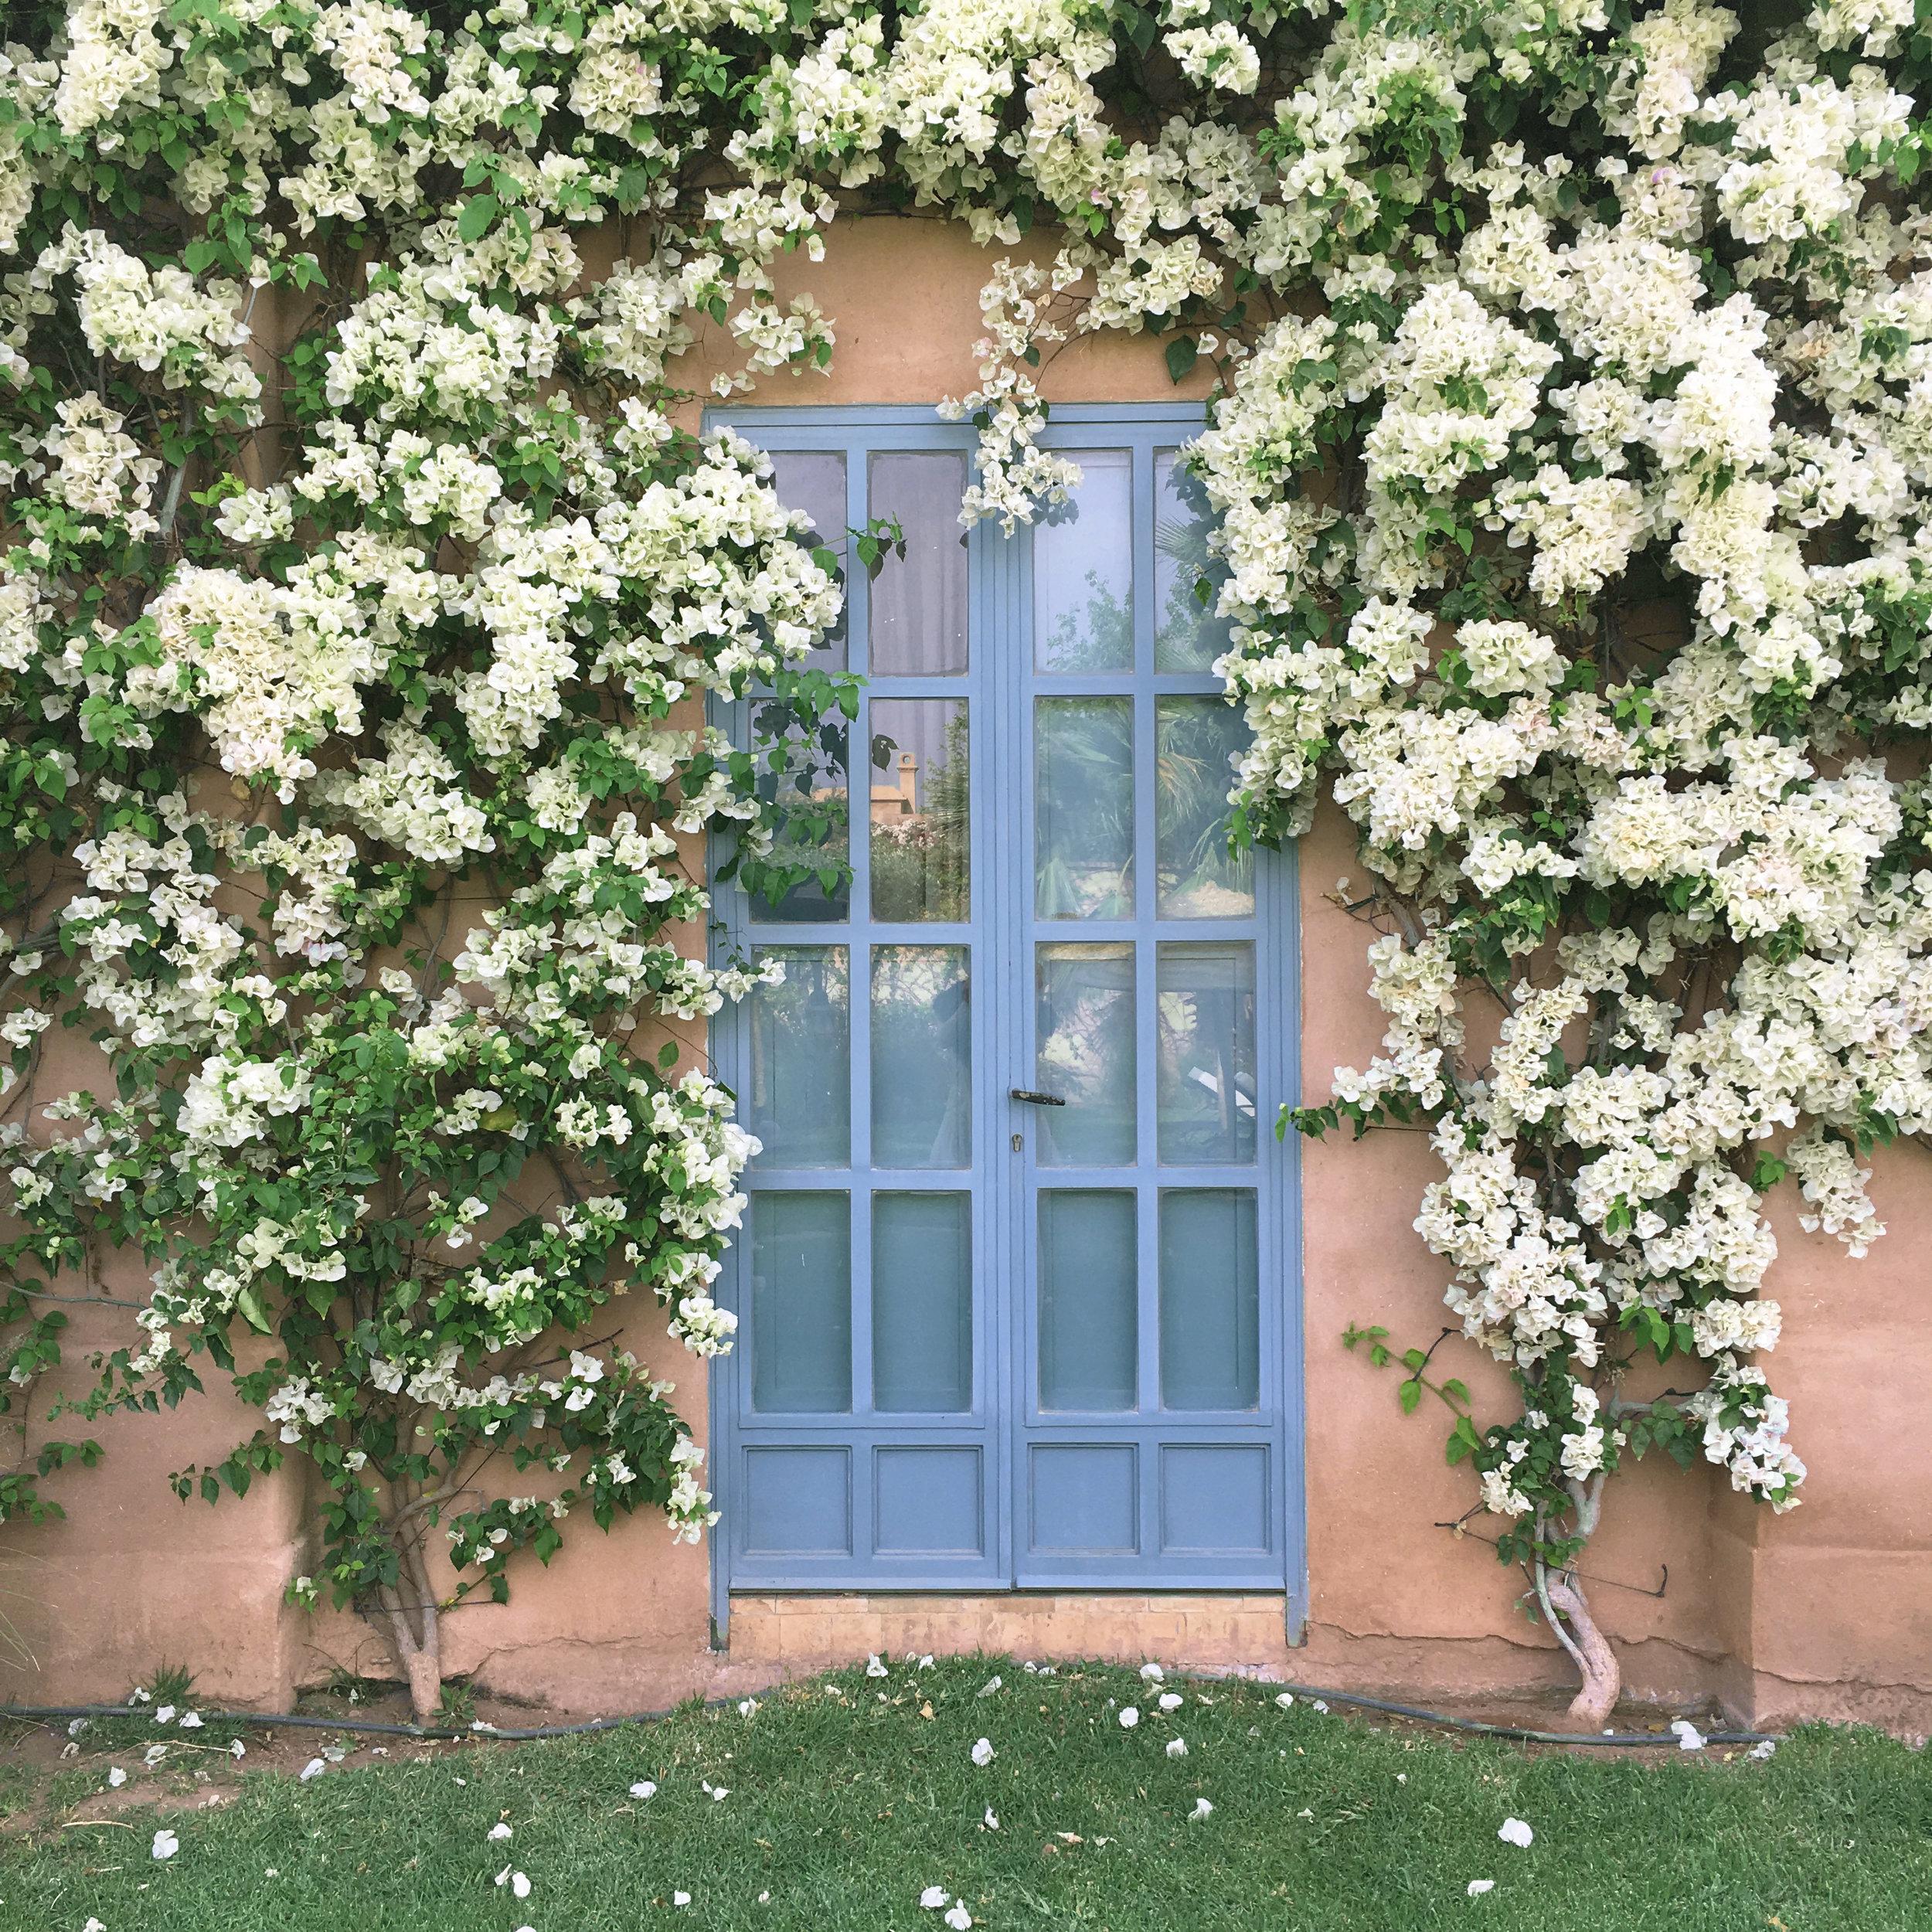 travellur_slow_travel_creative_retreat_morocco_watercolours_venue_door_flowers_edit.jpg